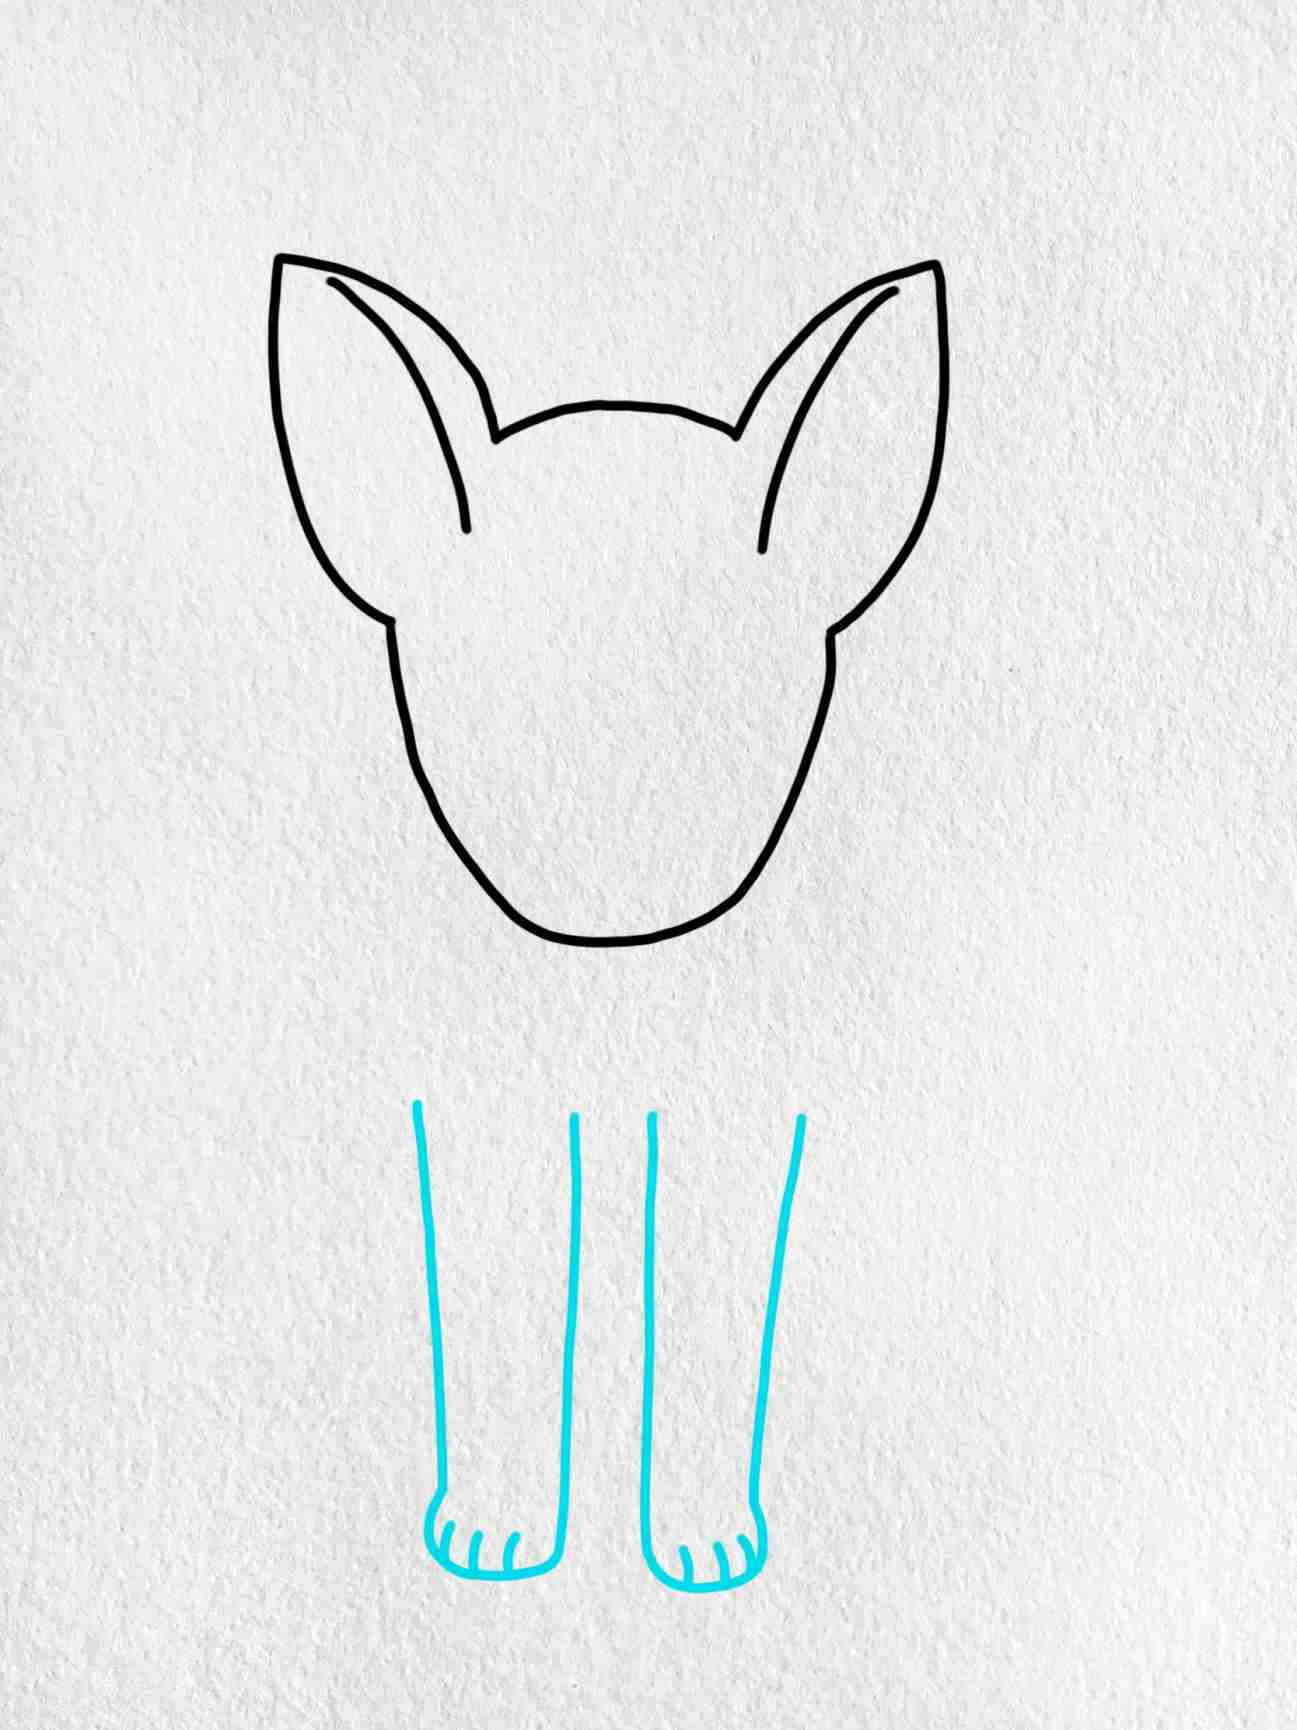 How To Draw A German Shepherd: Step 3